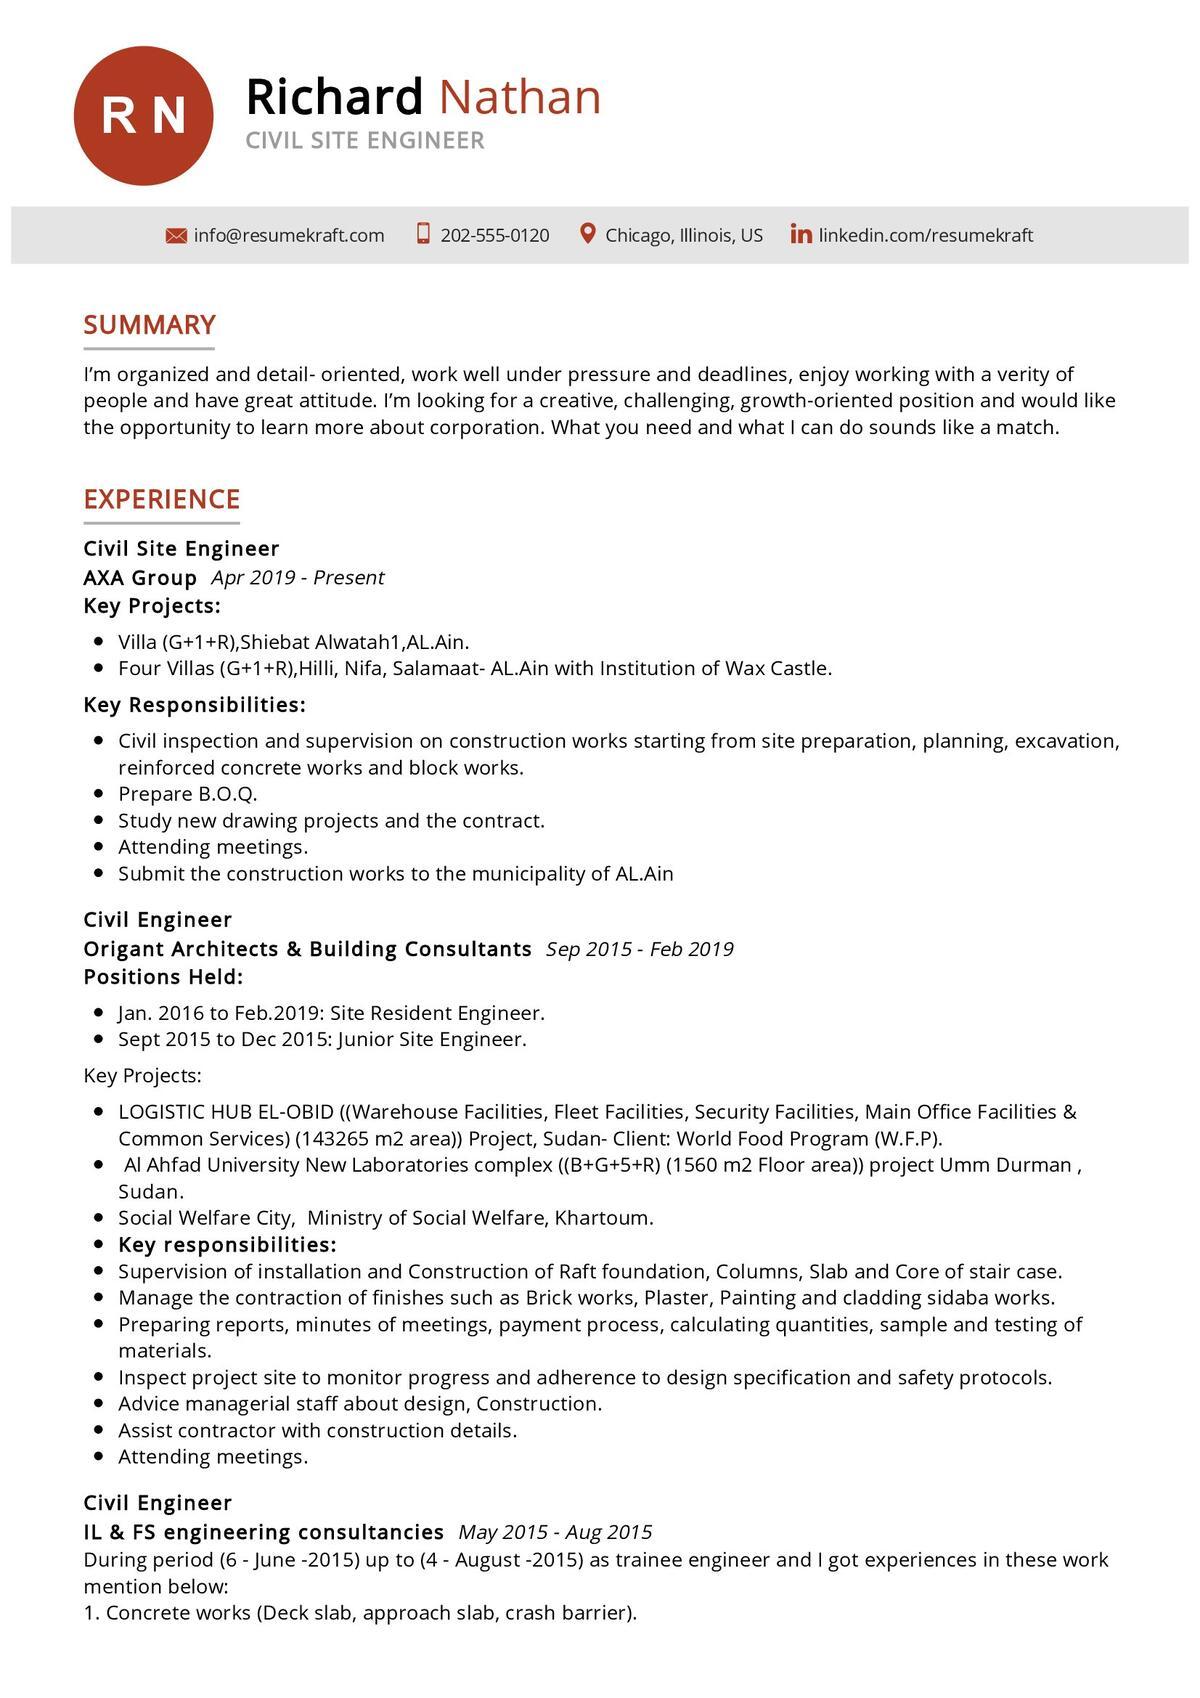 civil site engineer resume sample 2021  writing tips